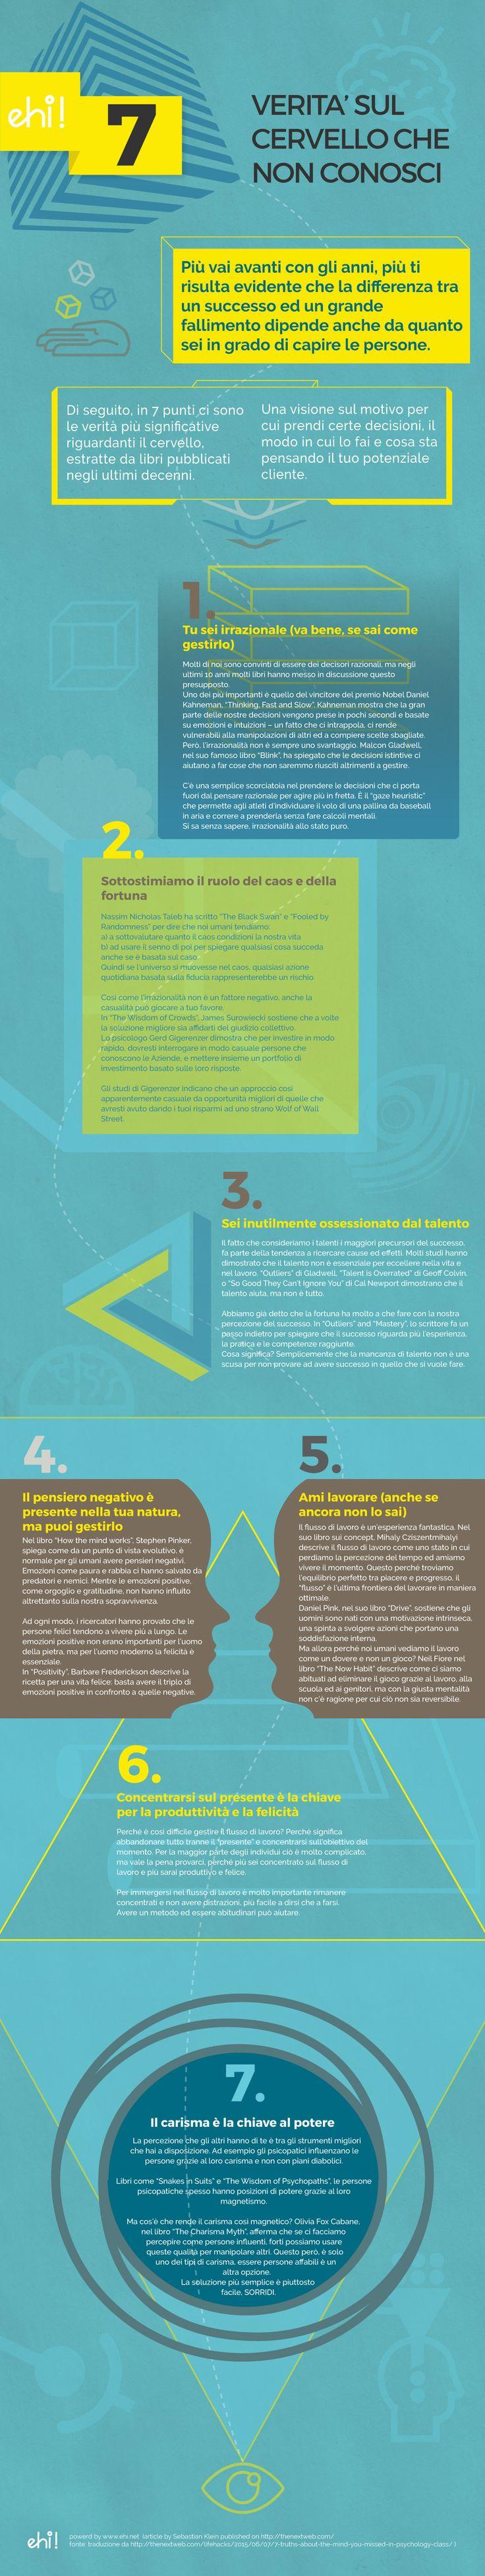 info_cervello_DEF #infographic infografica #cervello brain #social content